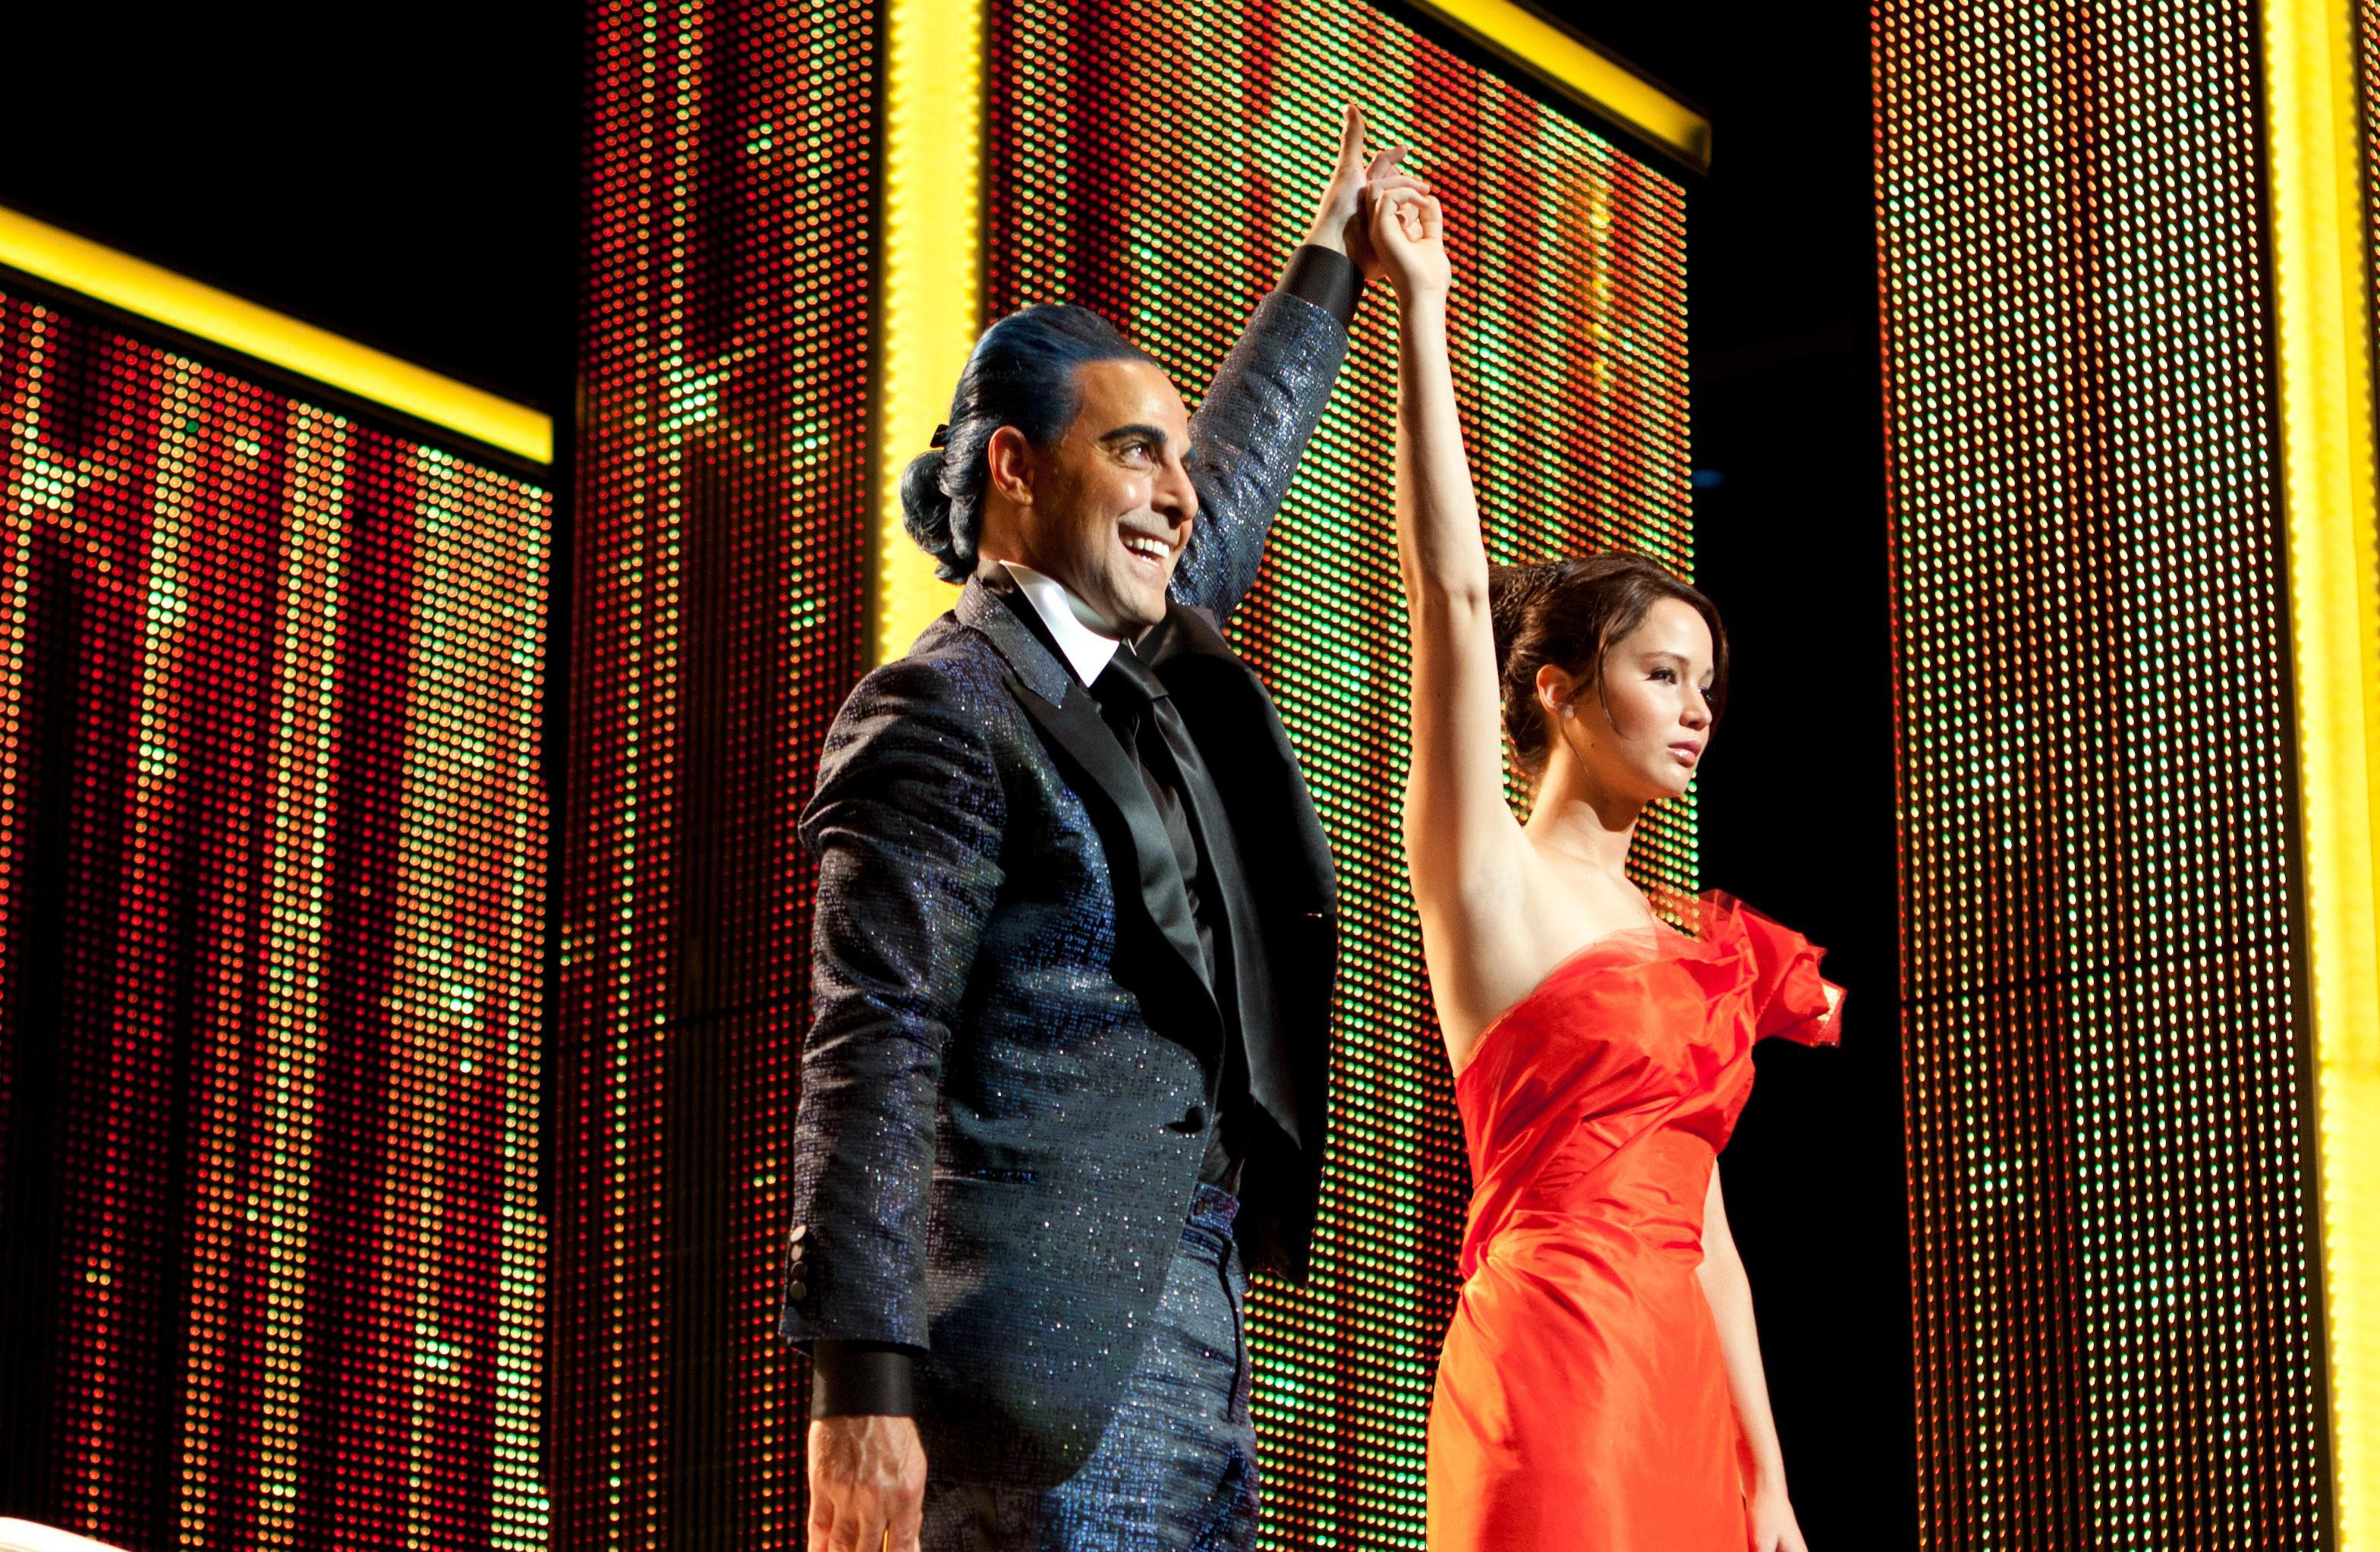 Jennifer Lawrence as Katniss   The Hunger Games